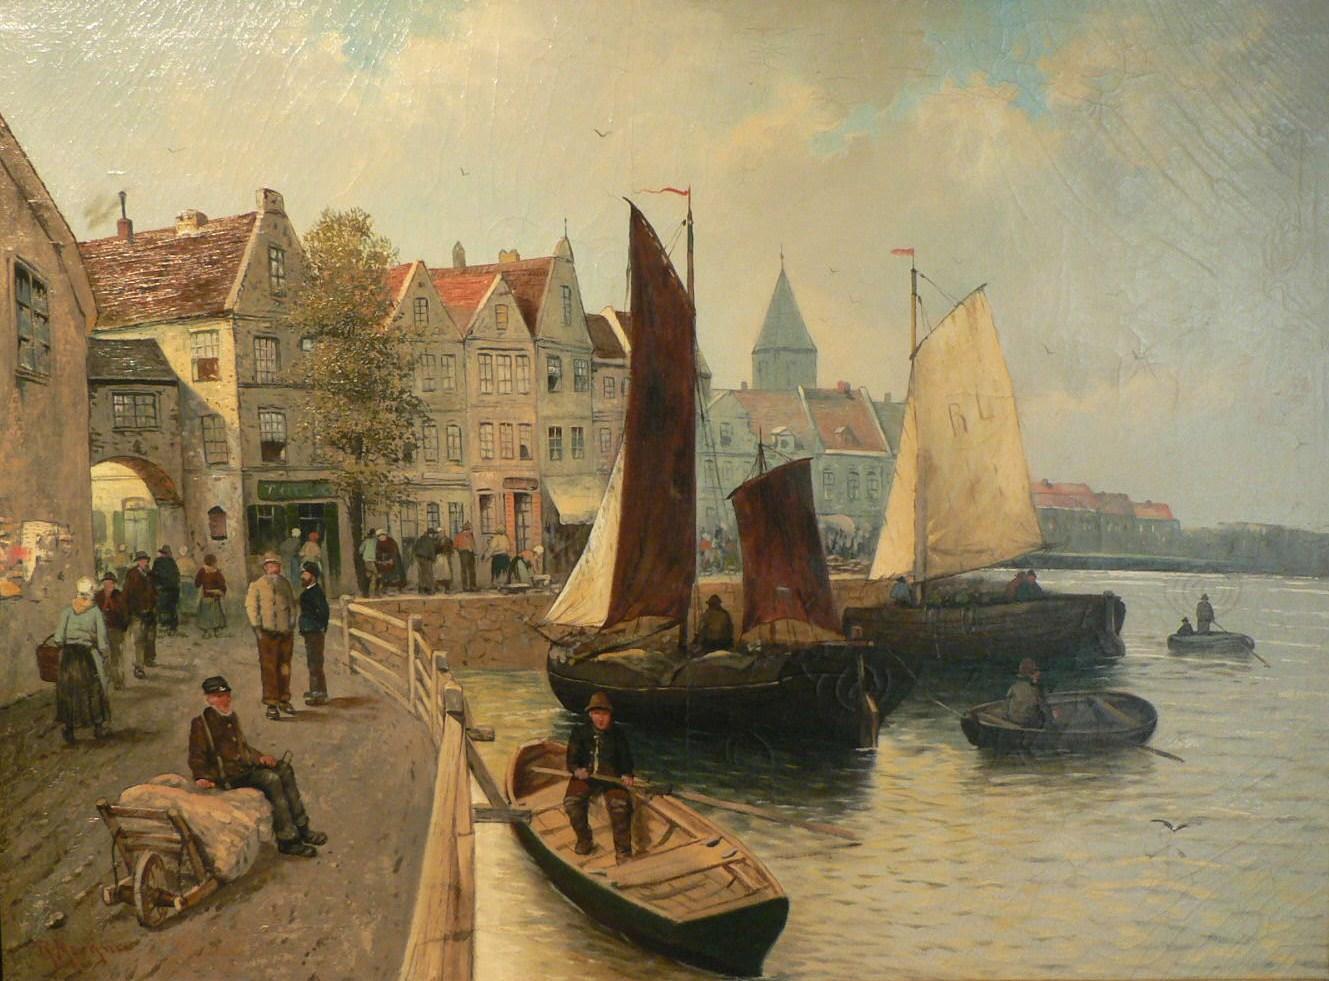 Karl kaufmann (1843 - 1905). обсуждение на liveinternet - ро.